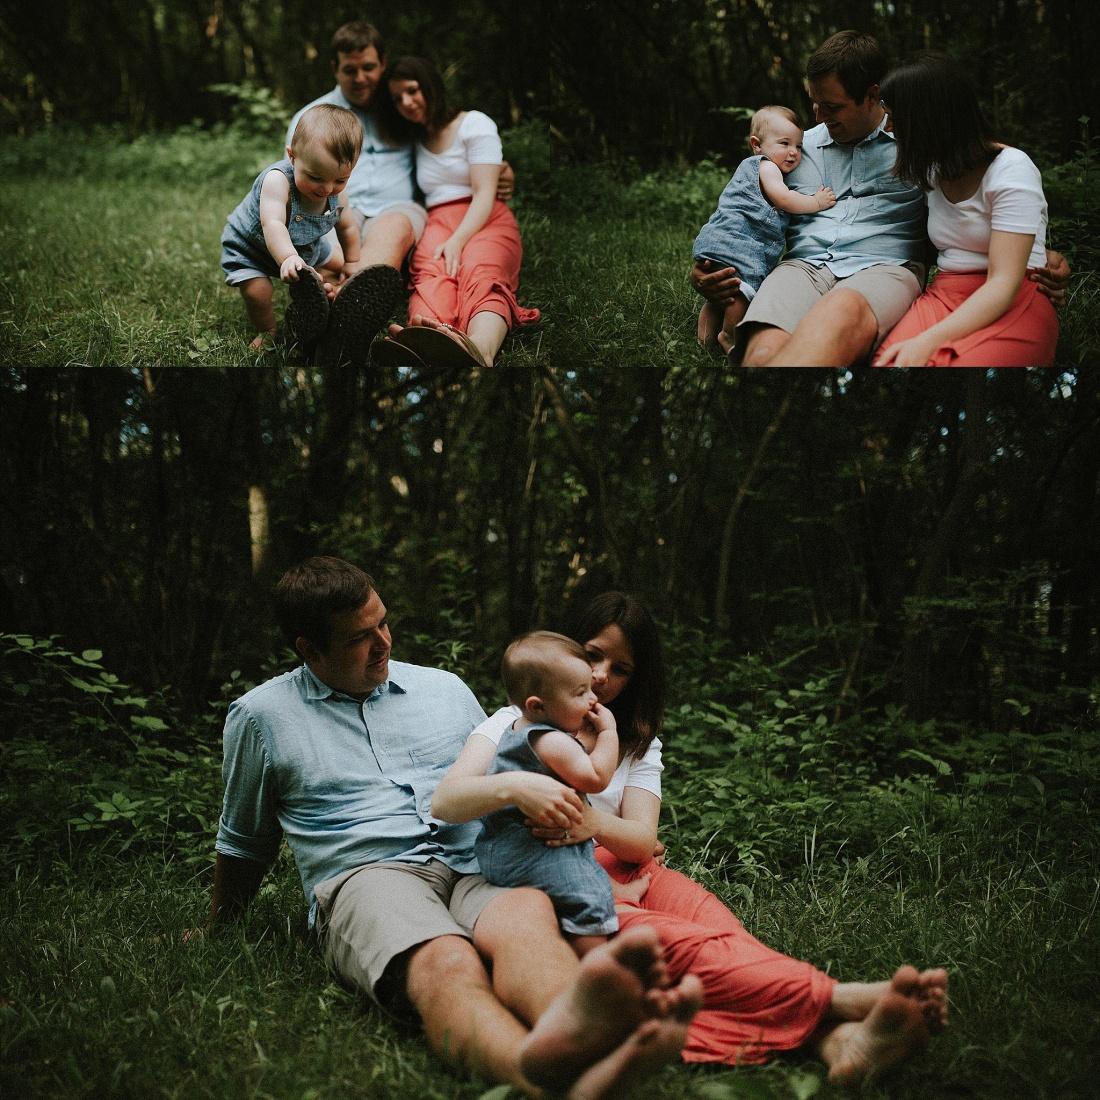 ADRI DE LA CRUZ CHICAGO AND WEST SUBURBS FAMILY PHOTOGRAPHER (16)